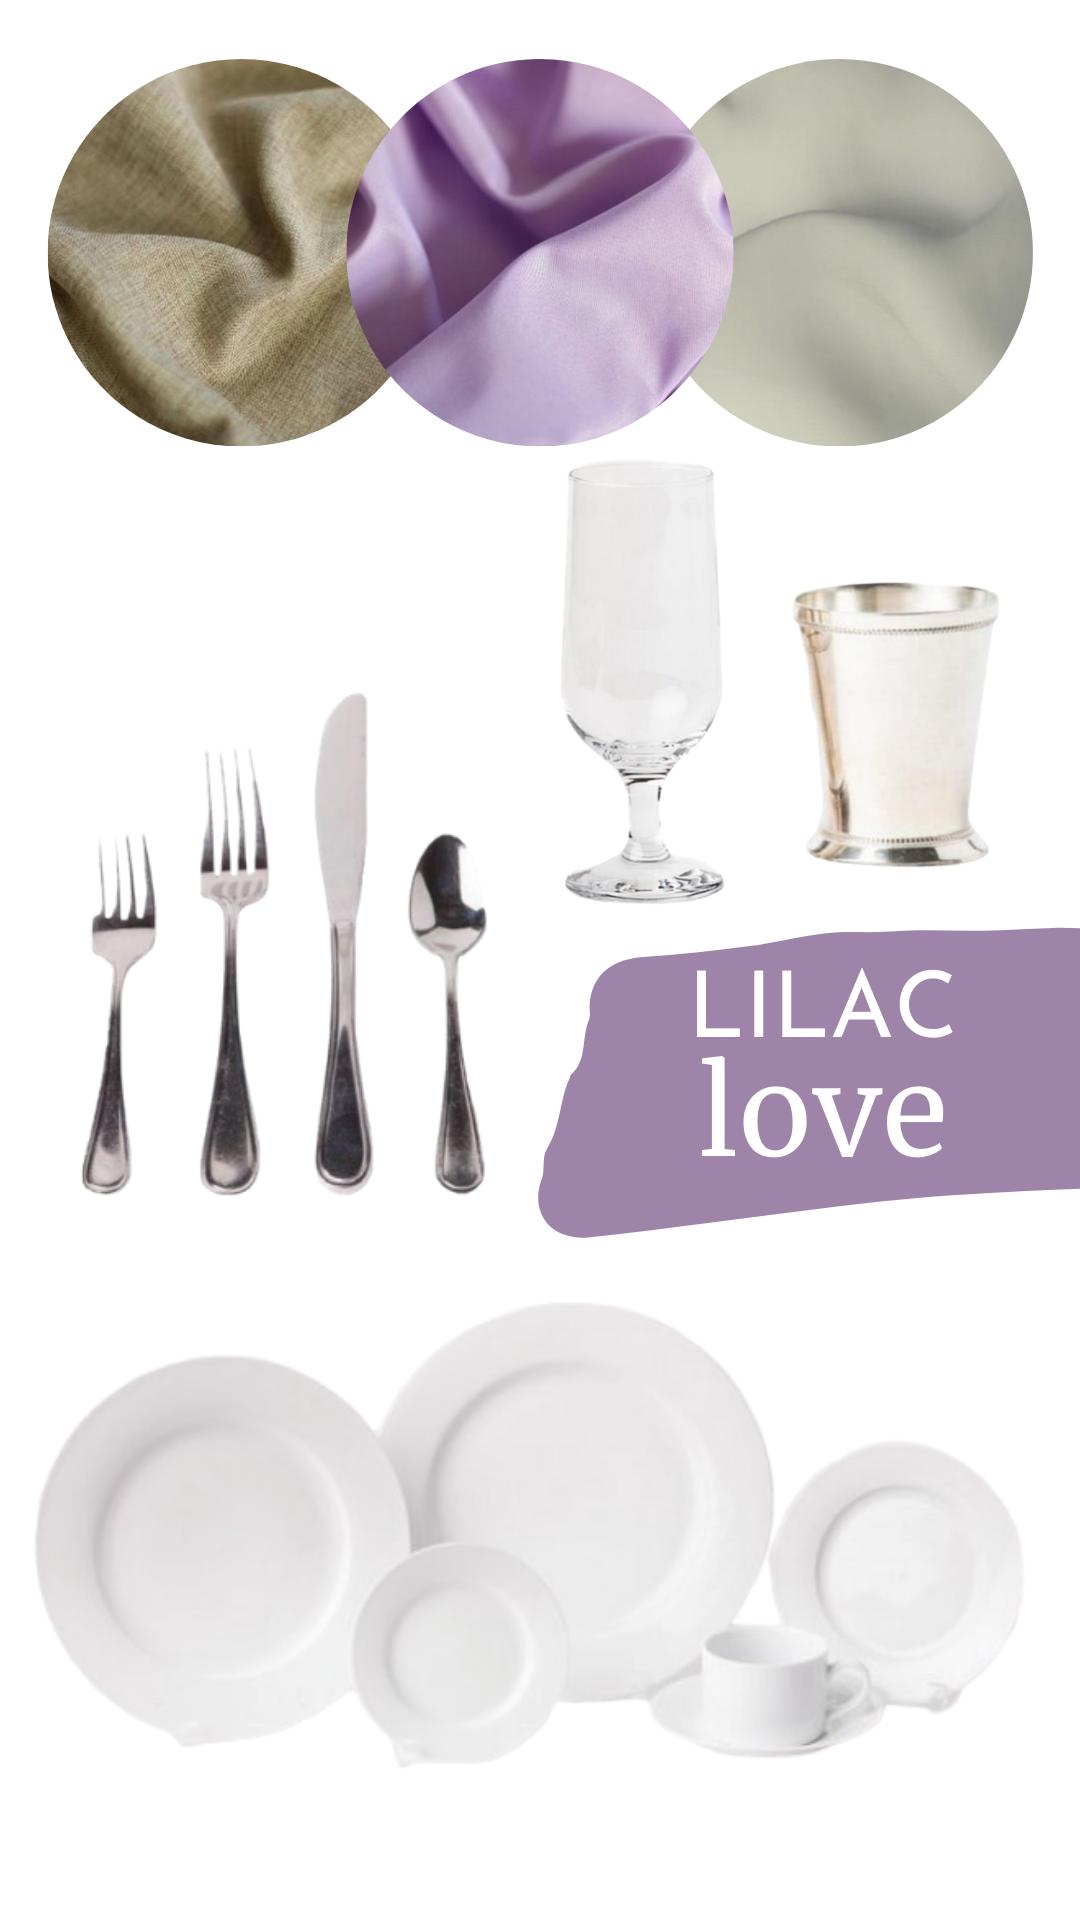 lilac love box